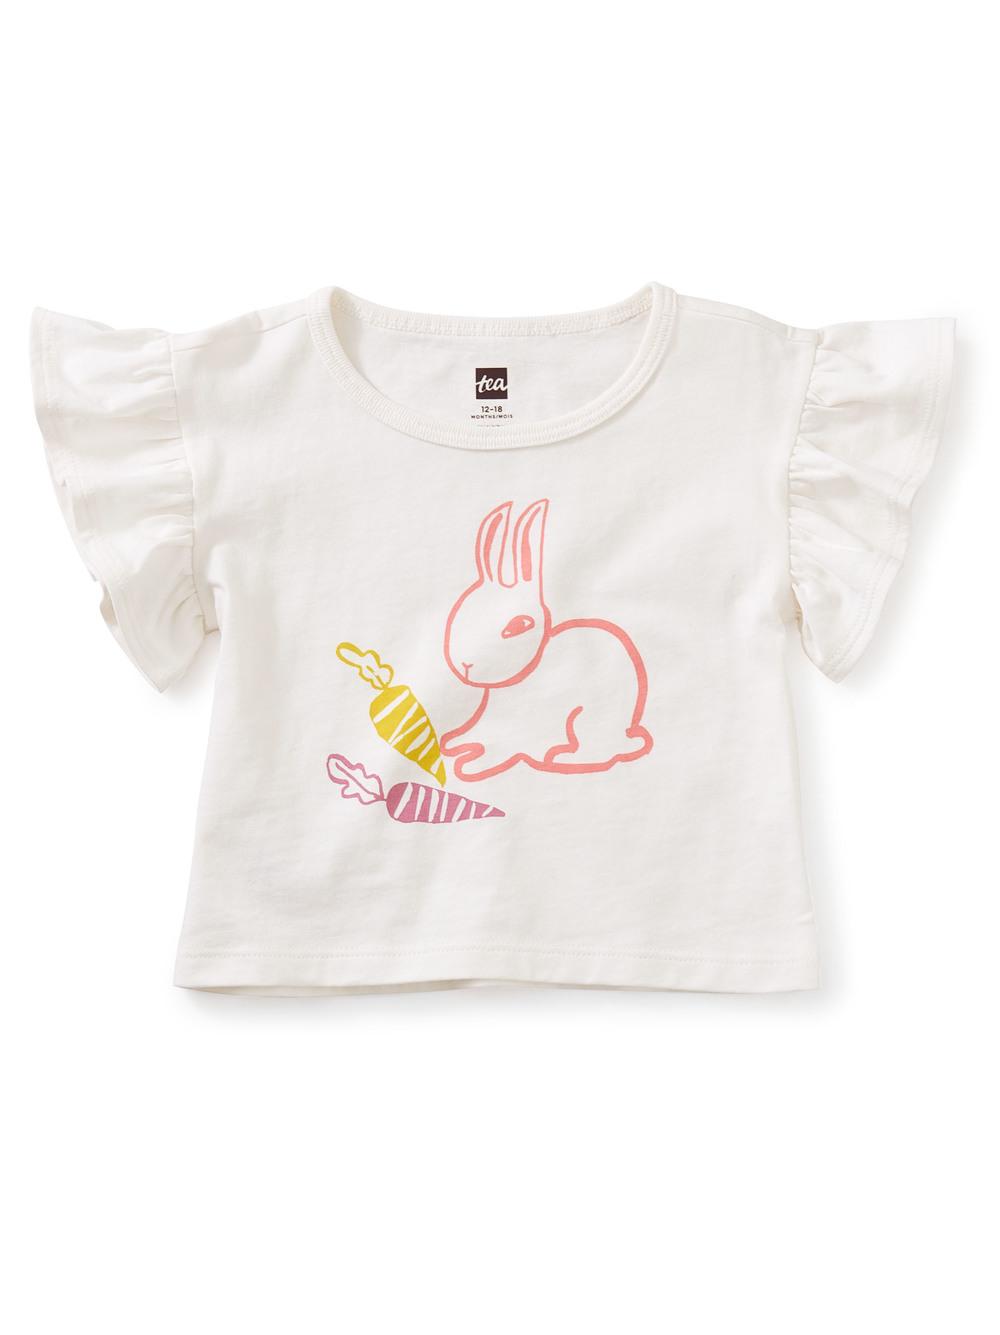 Bunny Flutter Sleeve Tee